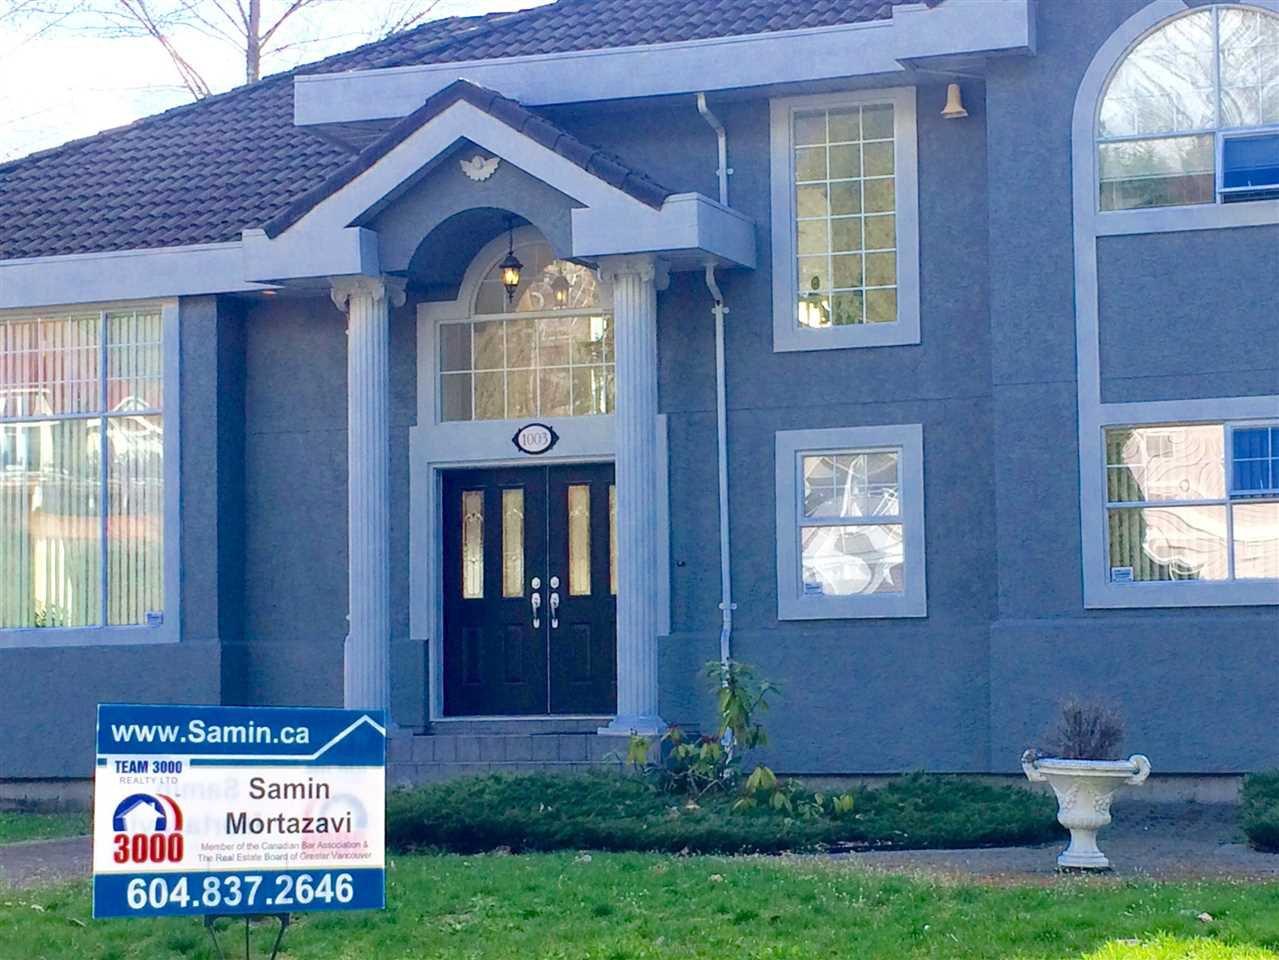 Main Photo: 1003 GLACIER VIEW DRIVE in Squamish: Garibaldi Highlands House for sale : MLS®# R2050052